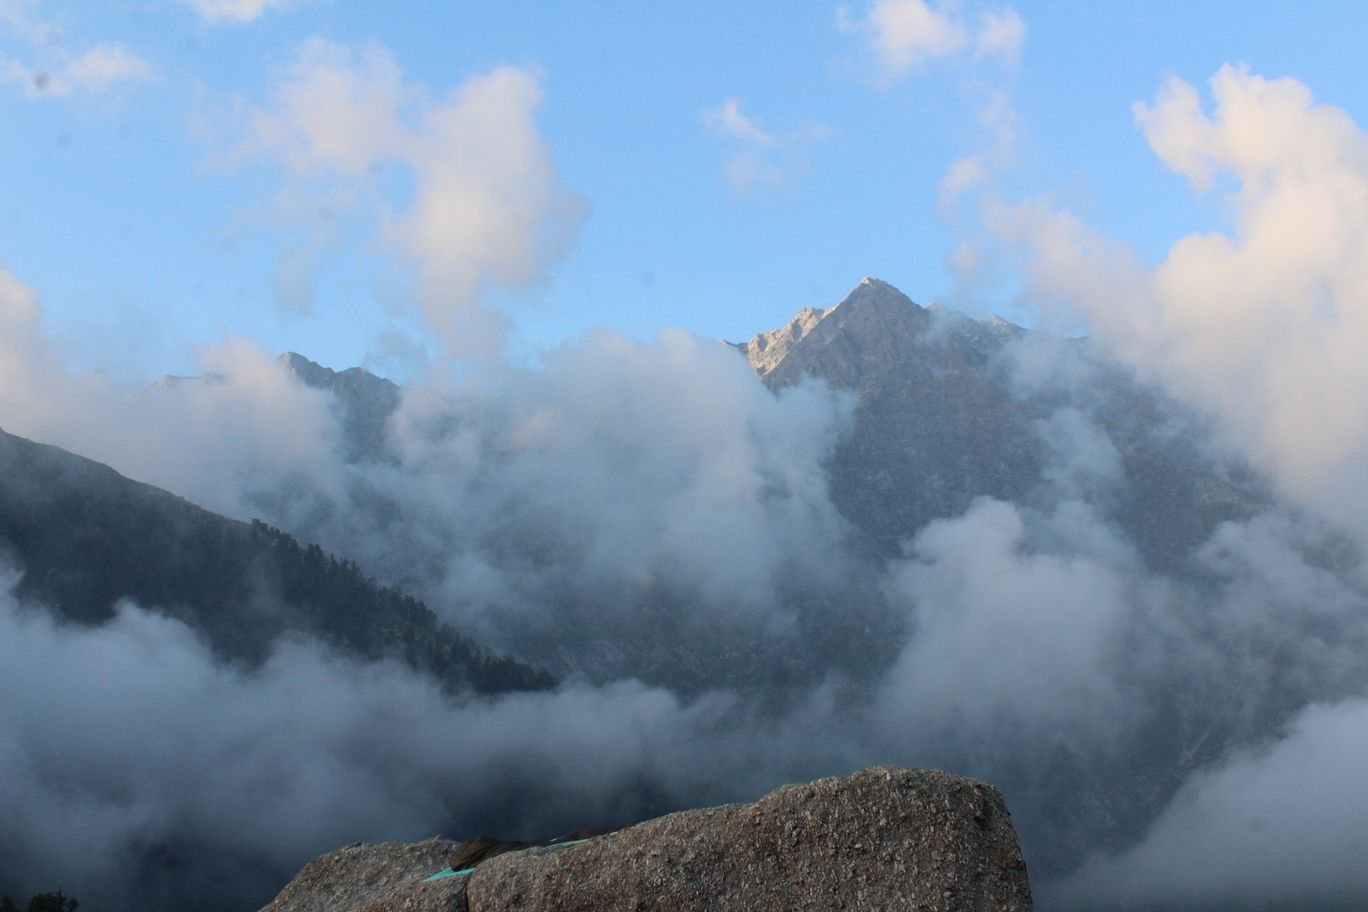 Photo of Triund Trek By Bhupendra Singh rajput